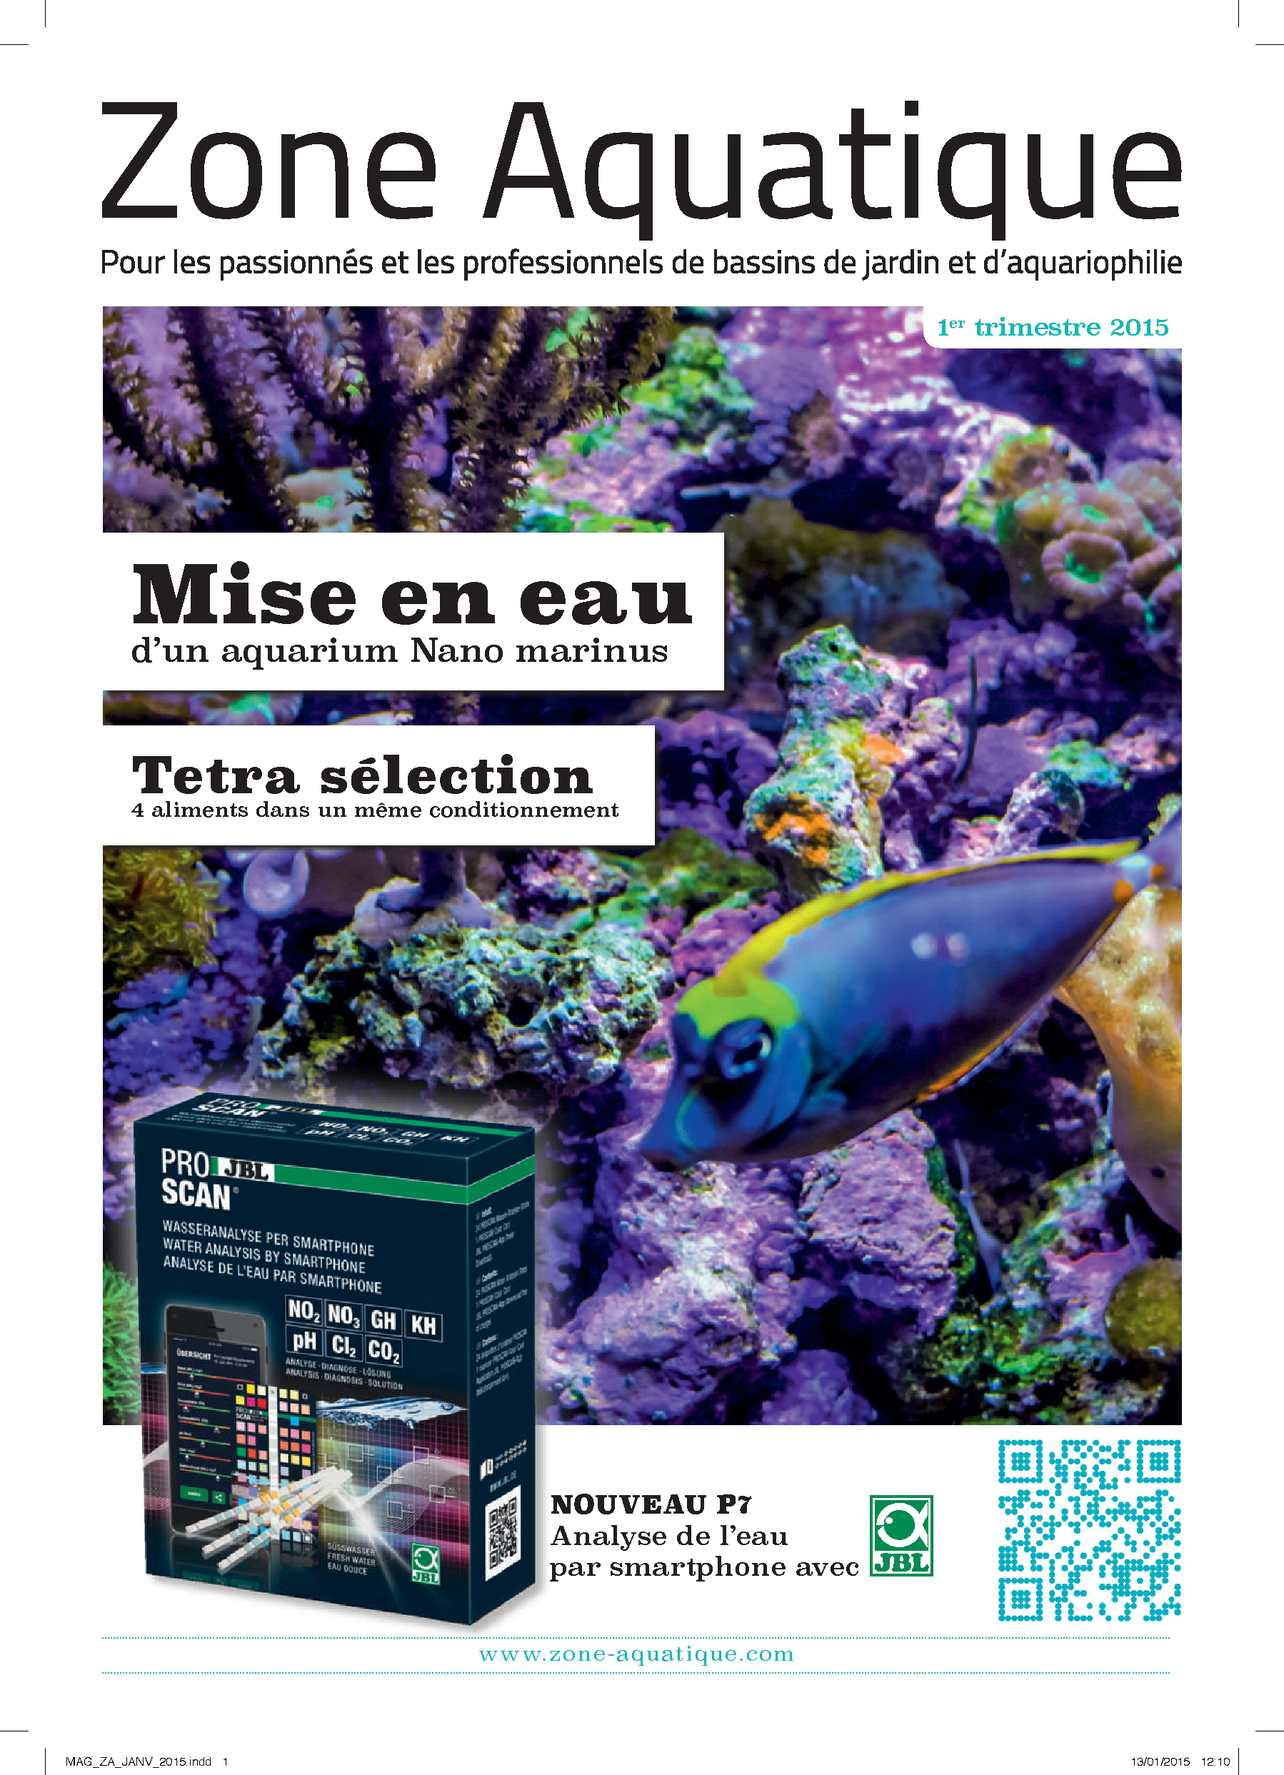 Magazine Zone Aquatique - 1er trimestre 2015